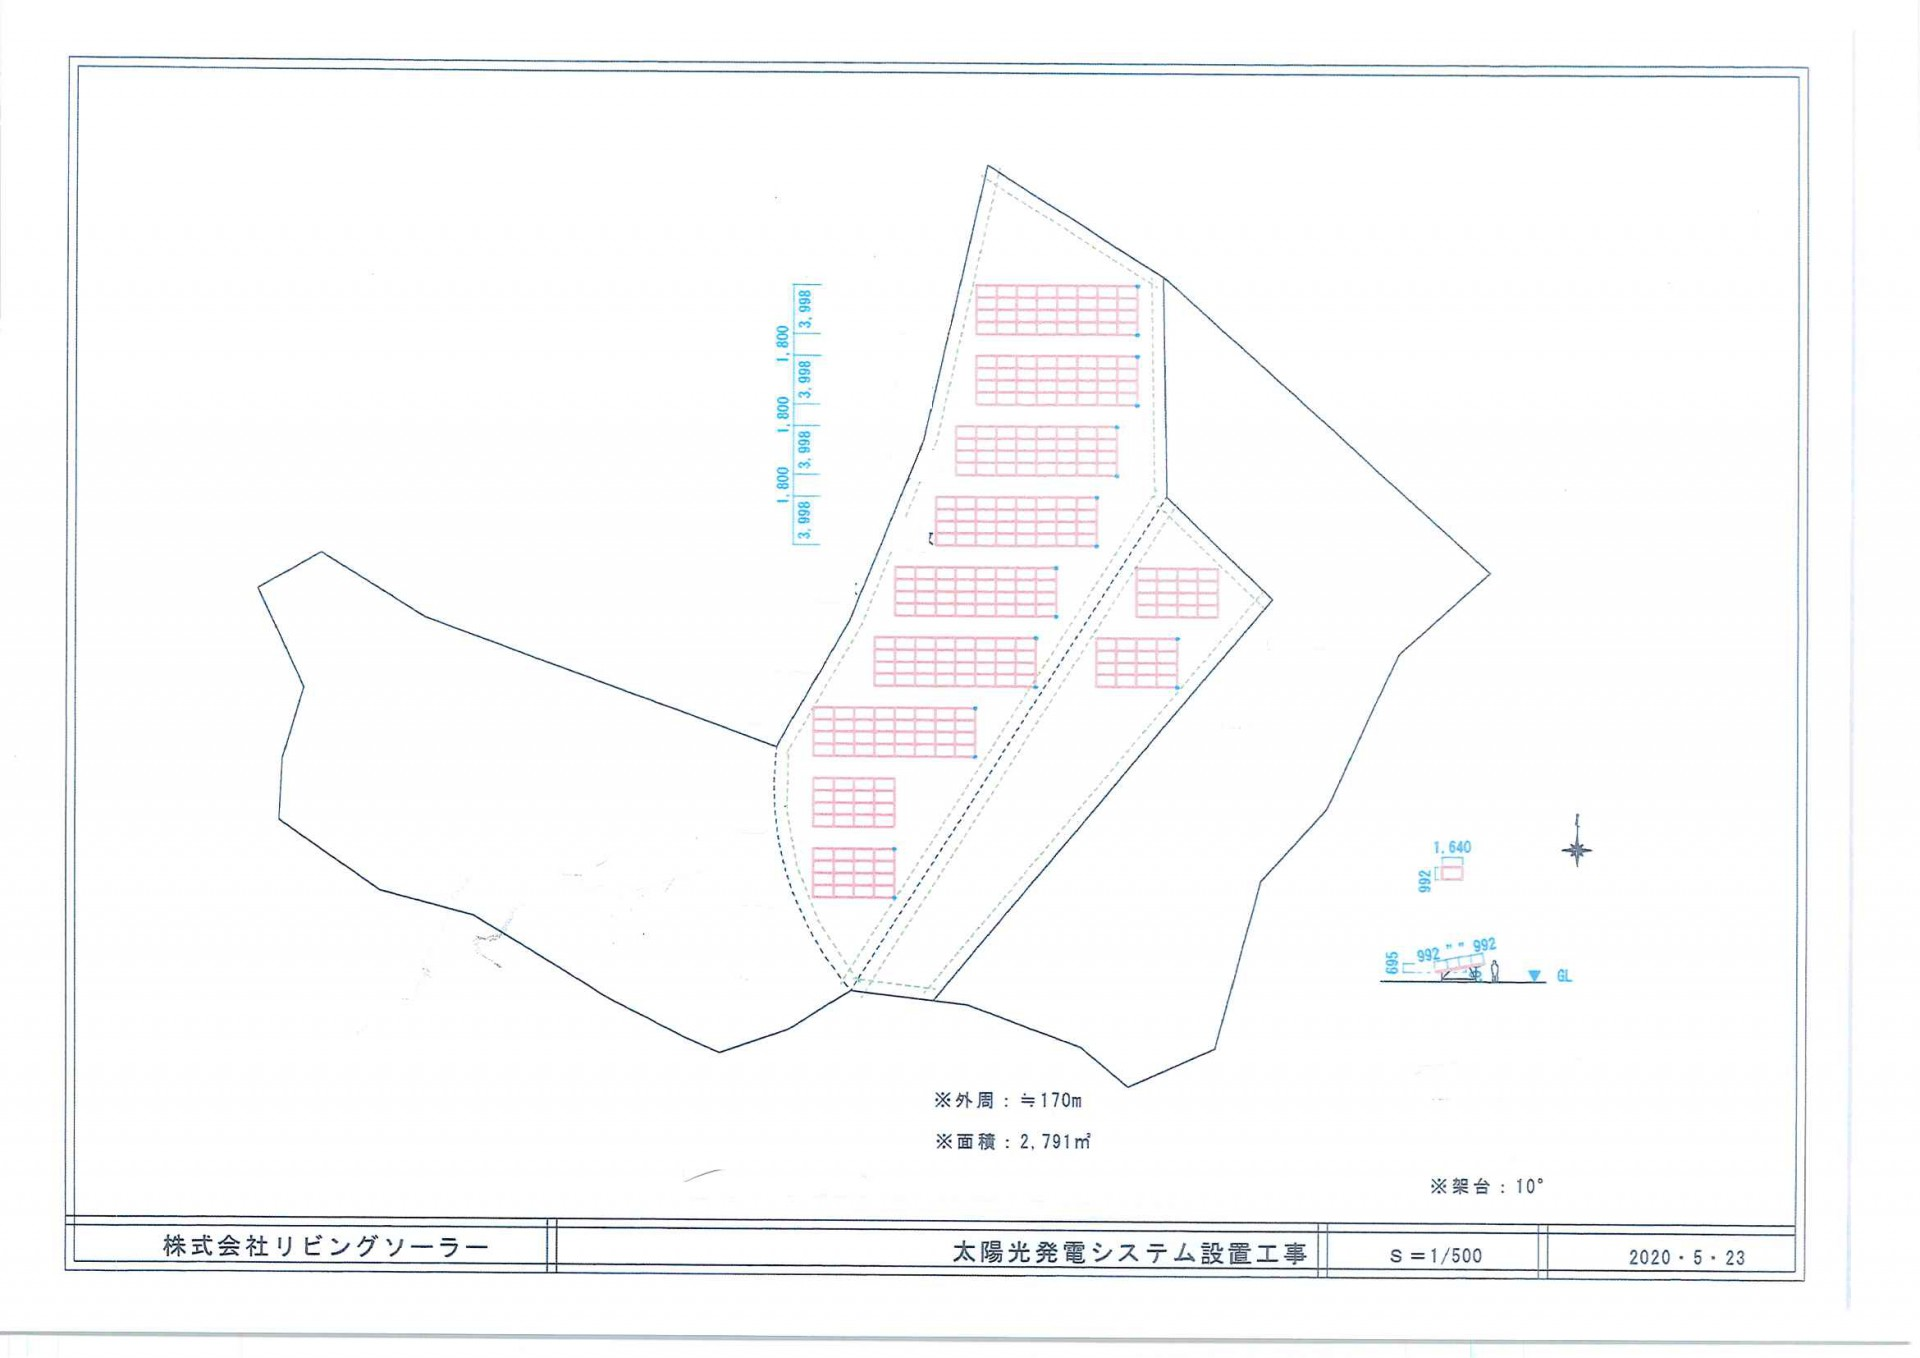 【LS】FIT14円 福島県いわき56発電所のメイン画像